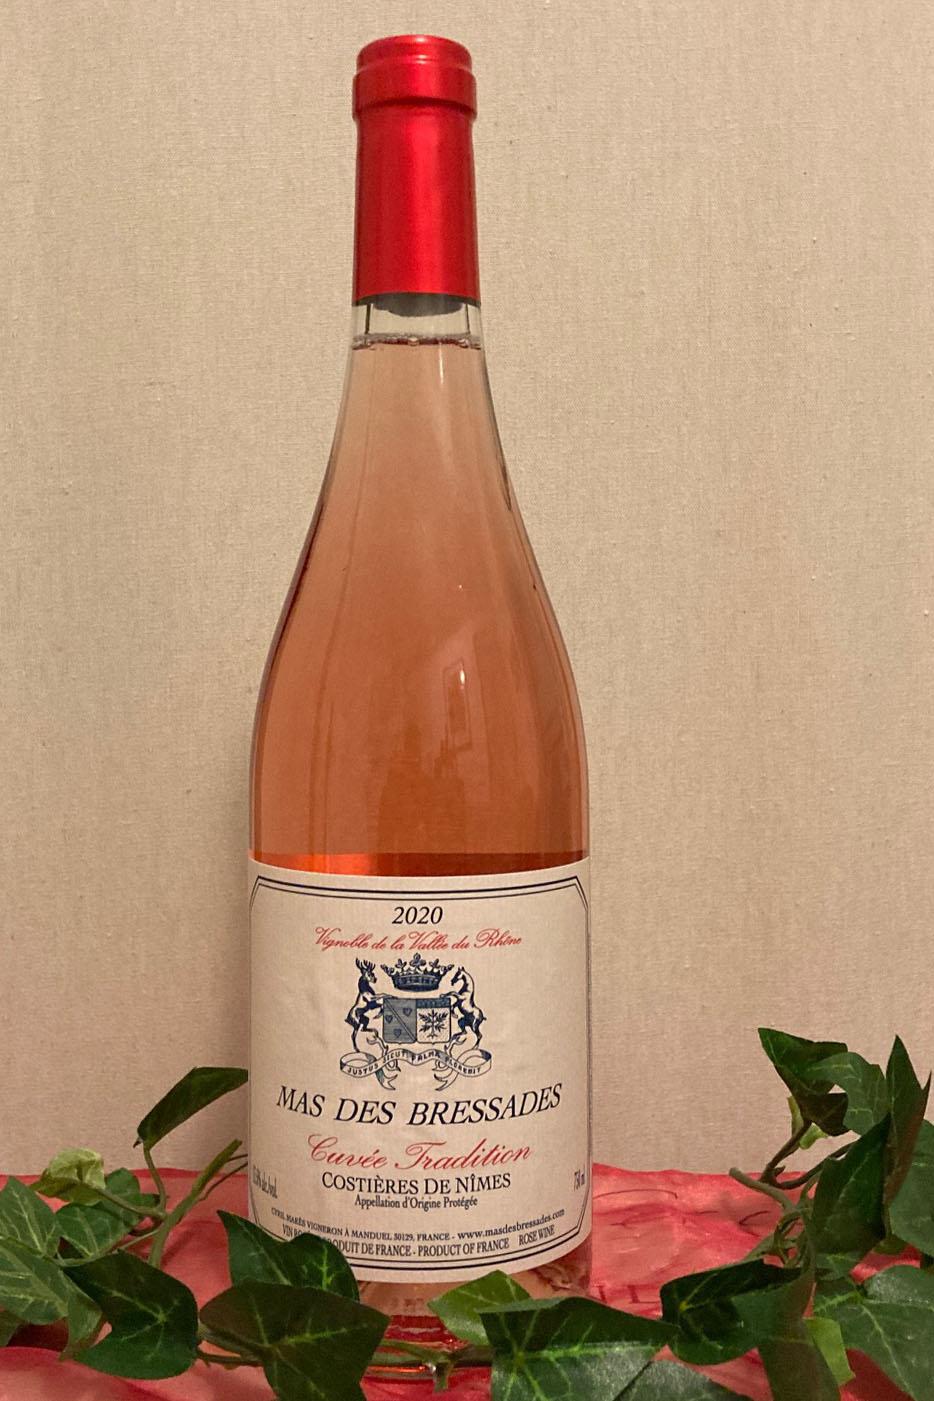 2020 Cuvée Tradition Rosé trocken Bio, Mas des Bressades, Costières de Nîmes